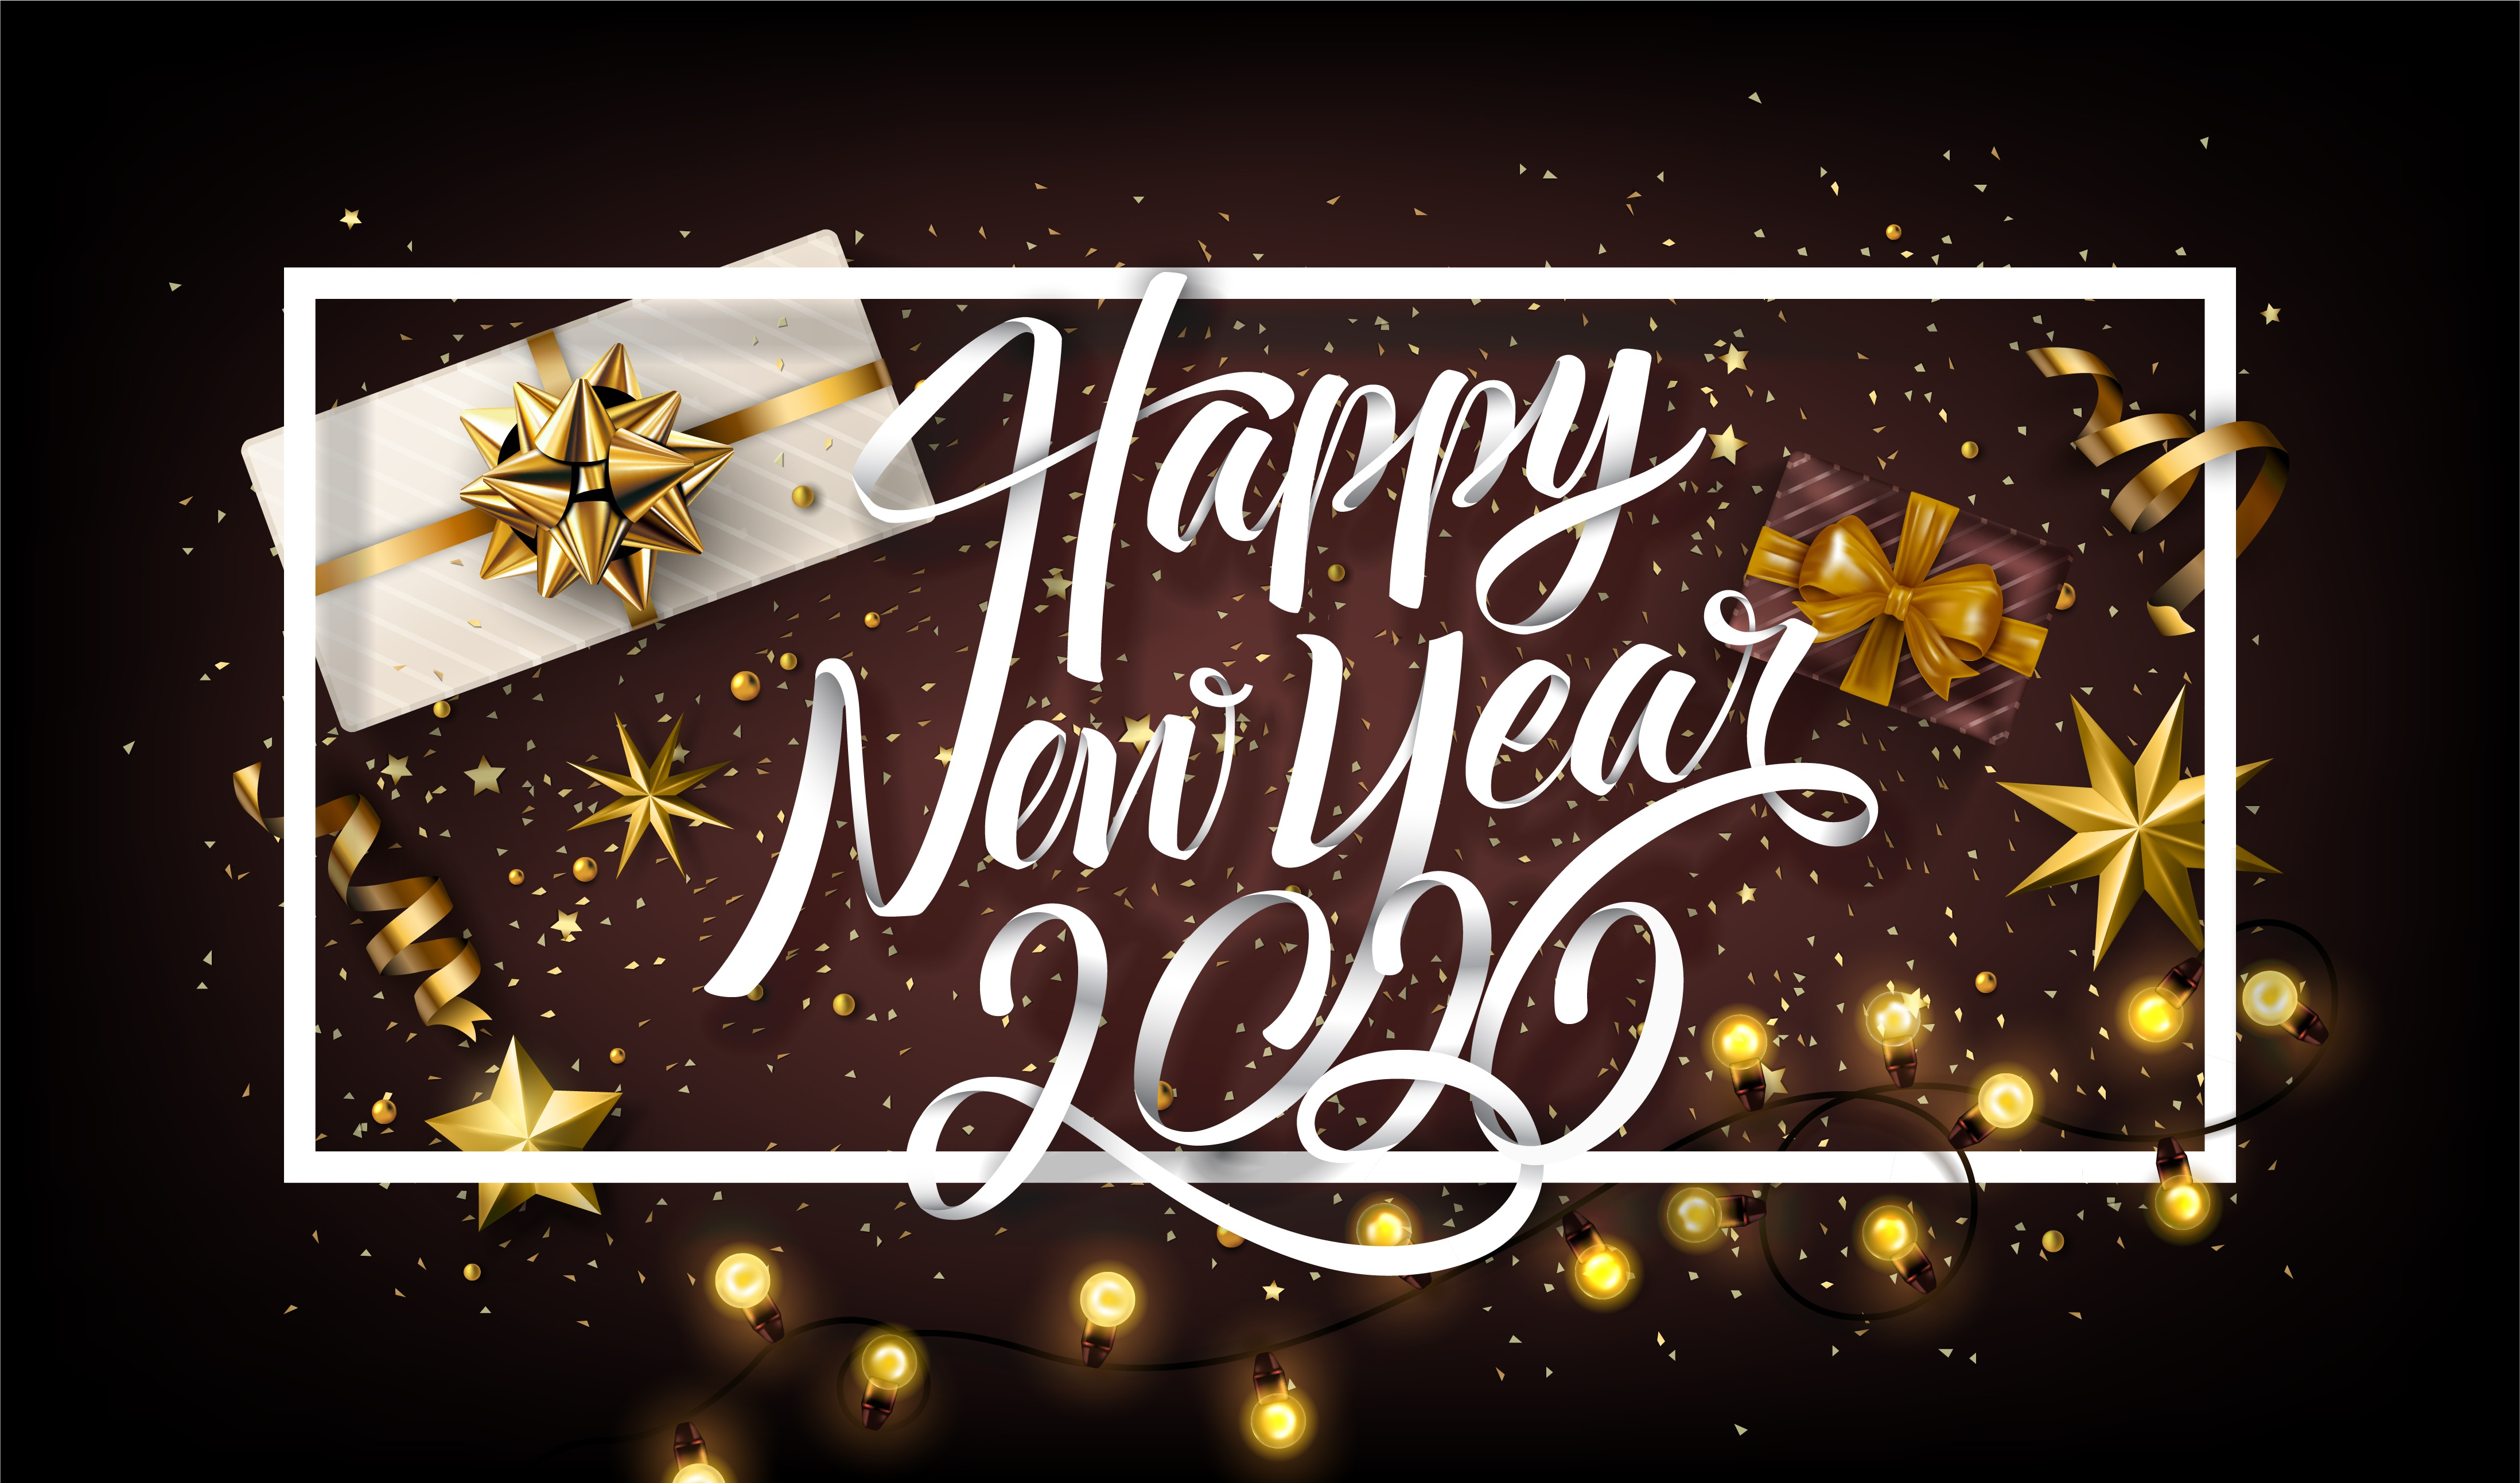 New Year 2020 4k Ultra Fond d'écran HD | Arrière-Plan | 4392x2585 | ID:1057926 - Wallpaper Abyss